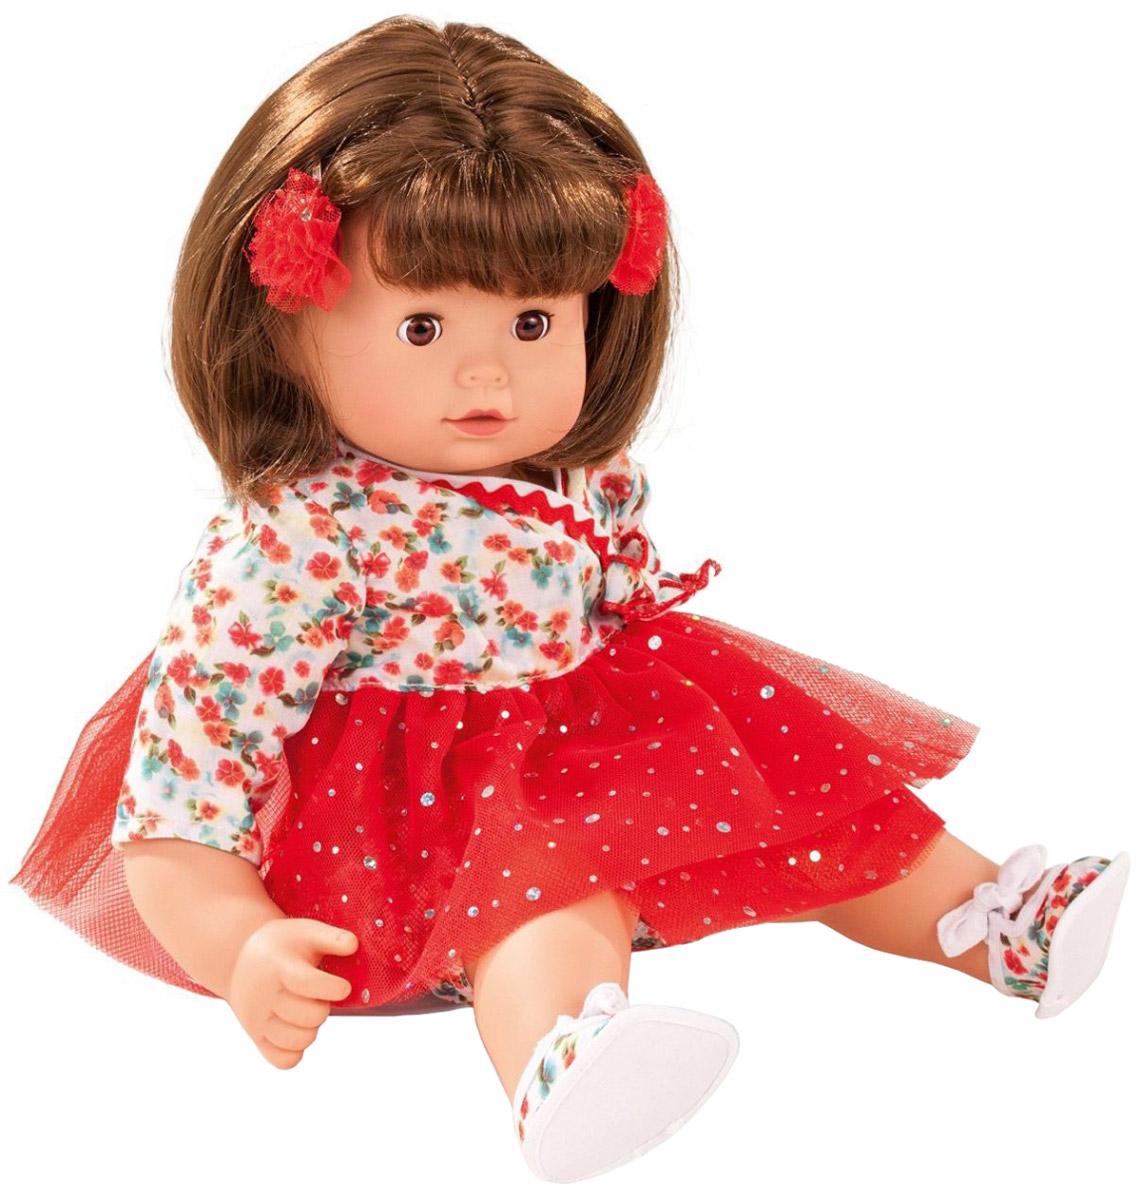 Gotz Кукла Макси Маффин брюнетка